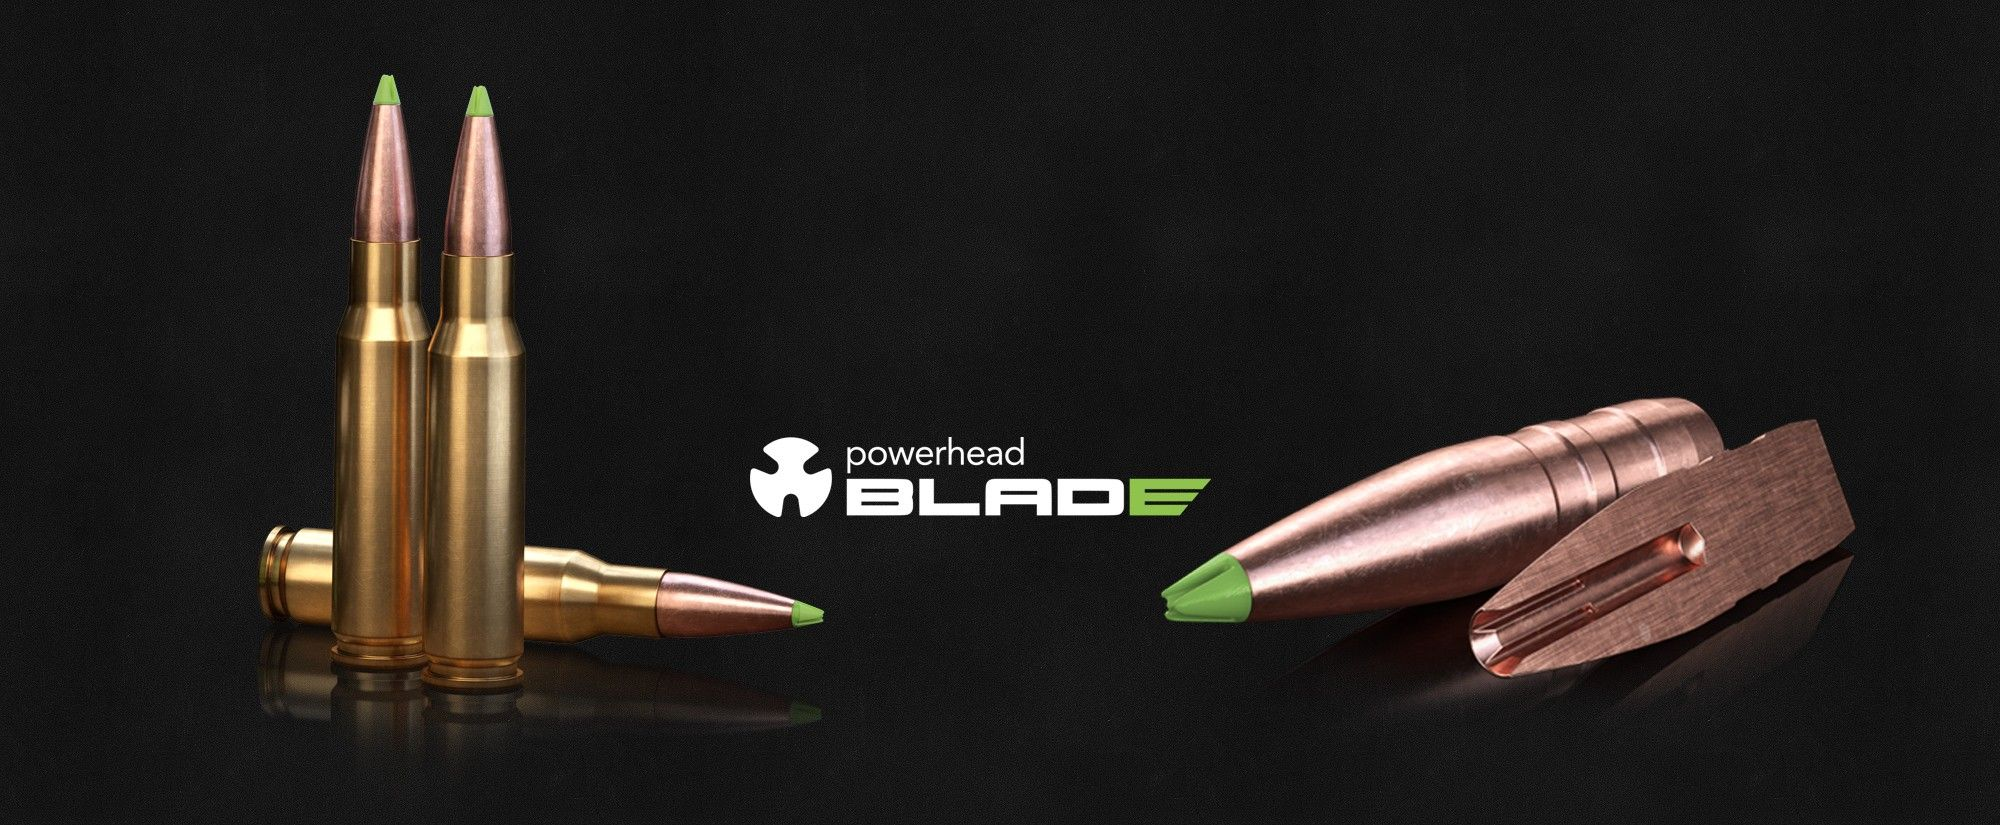 Sako 9,3x62 patruuna 16,2g Blade (613D), 20 kpl / ras